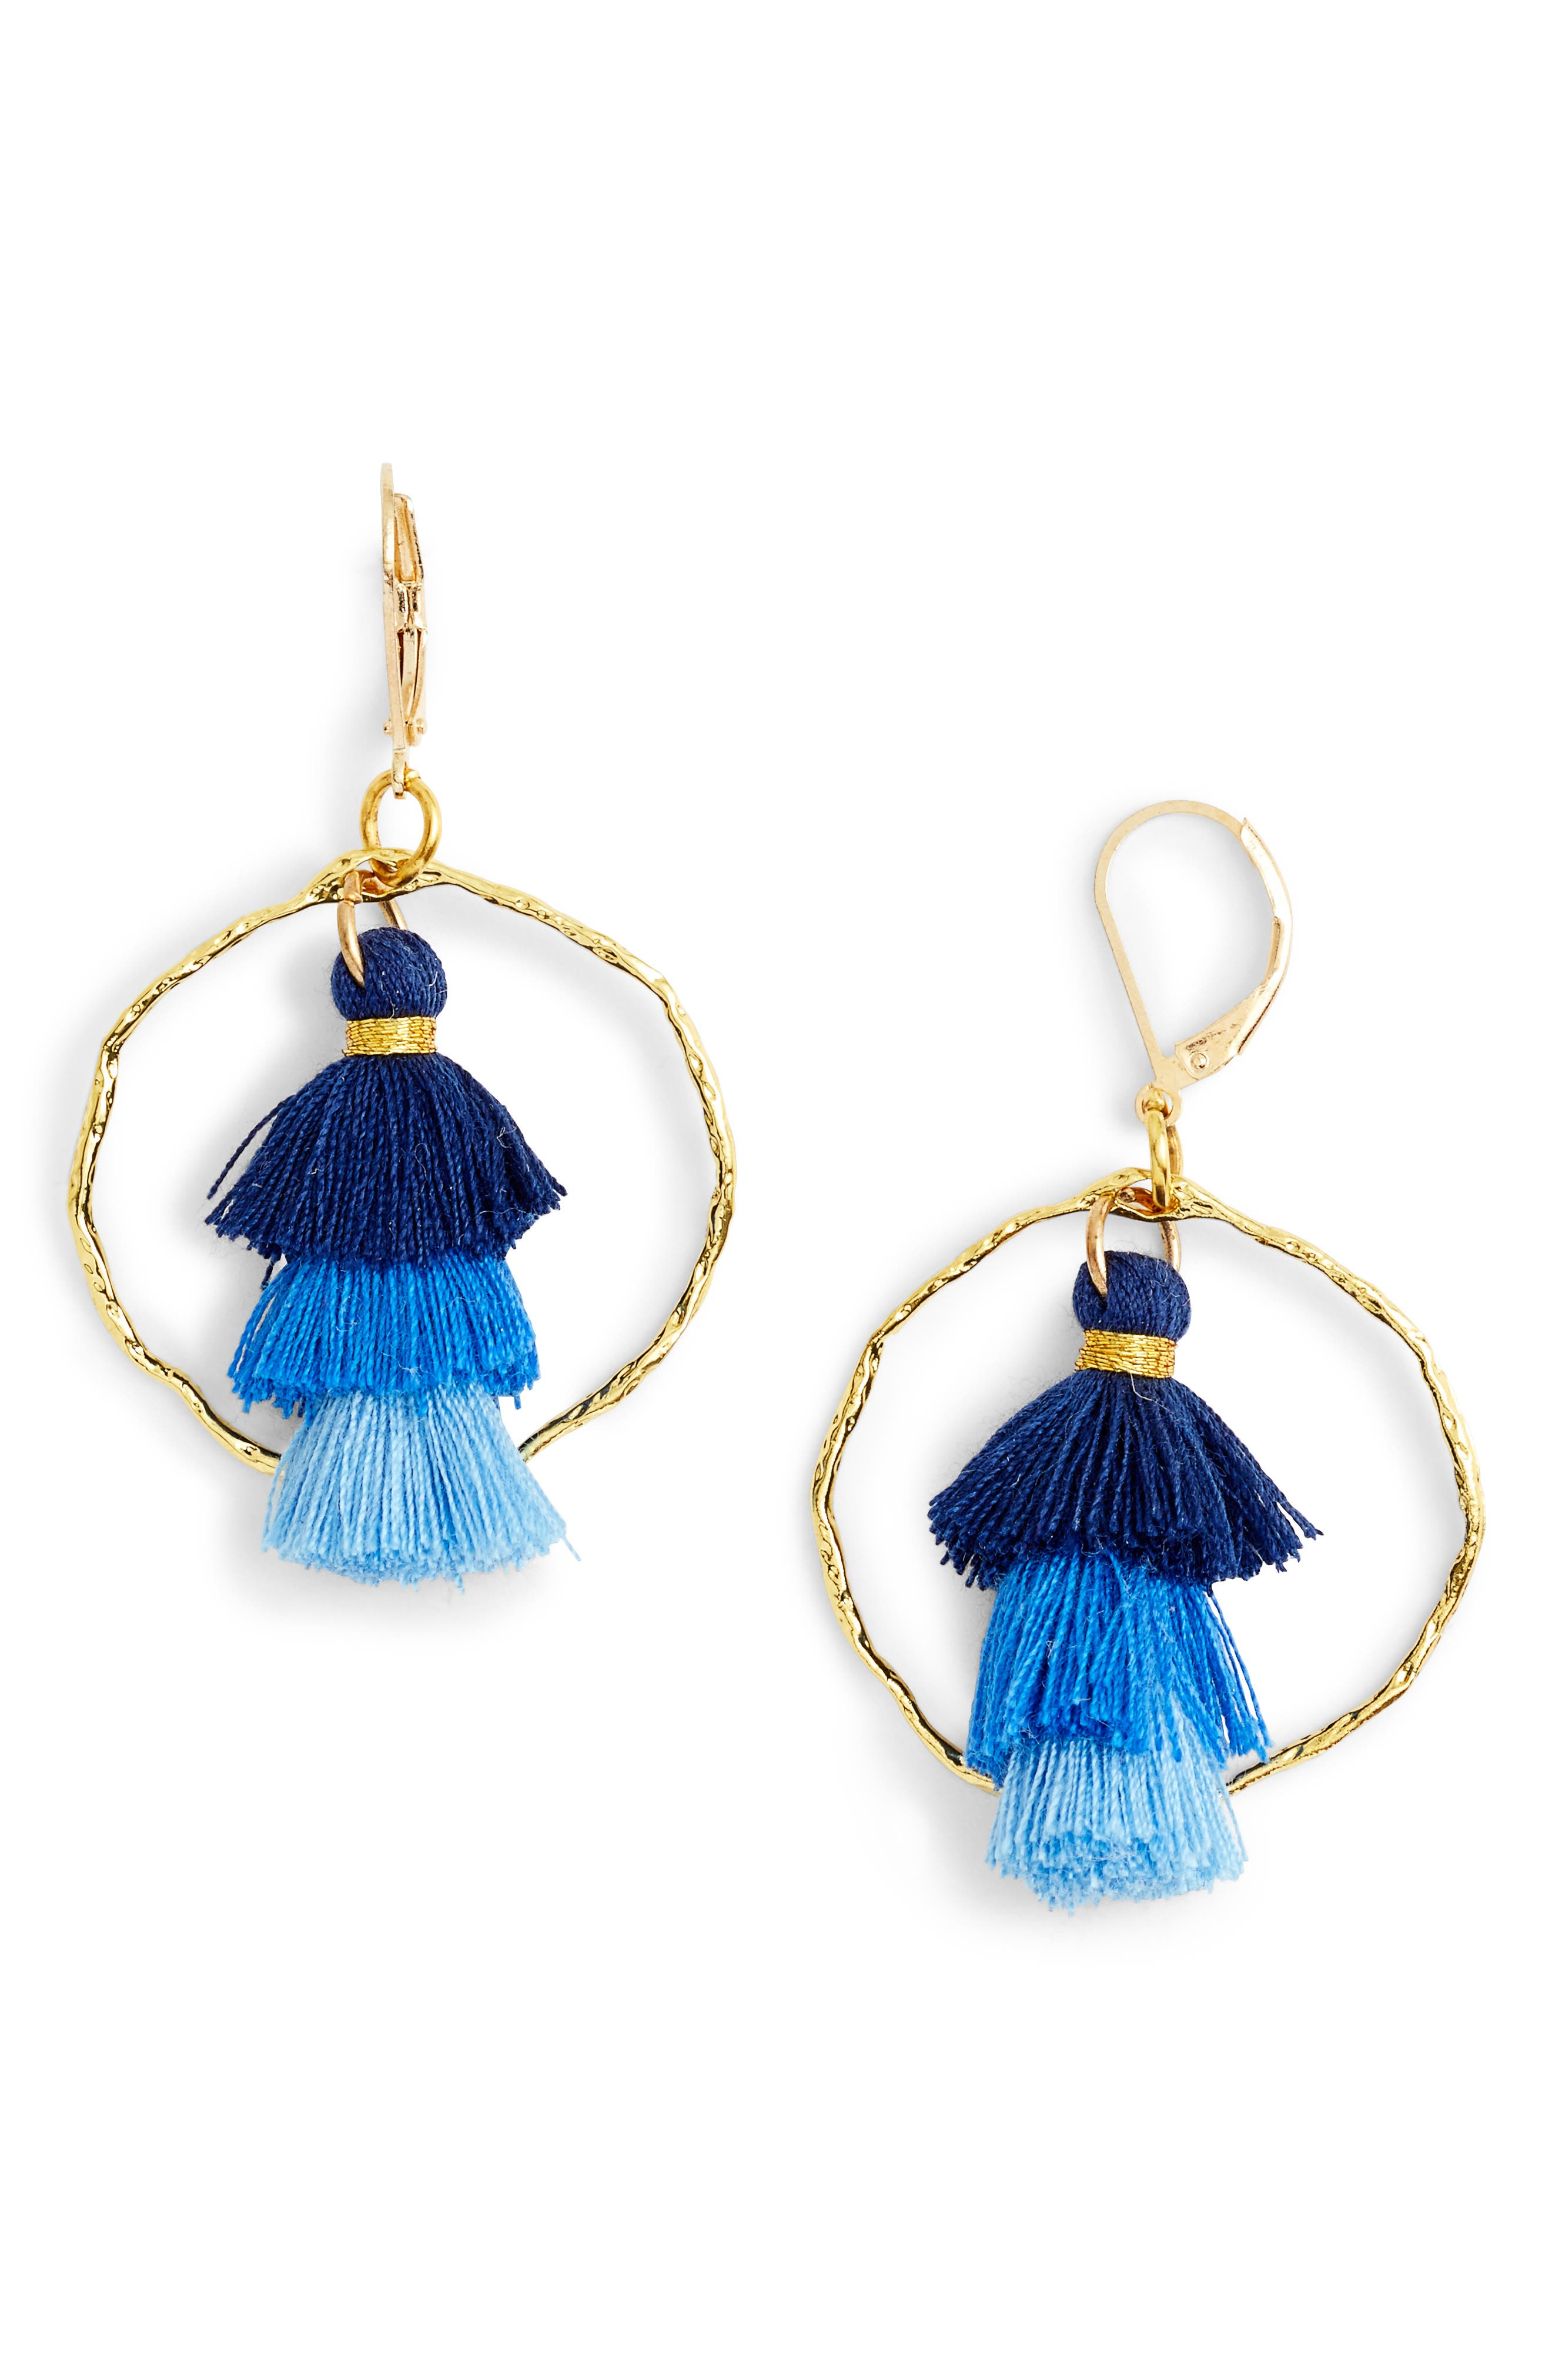 Ibiza Tassel & Hammered Hoop Earrings,                         Main,                         color, Blue/ Gold